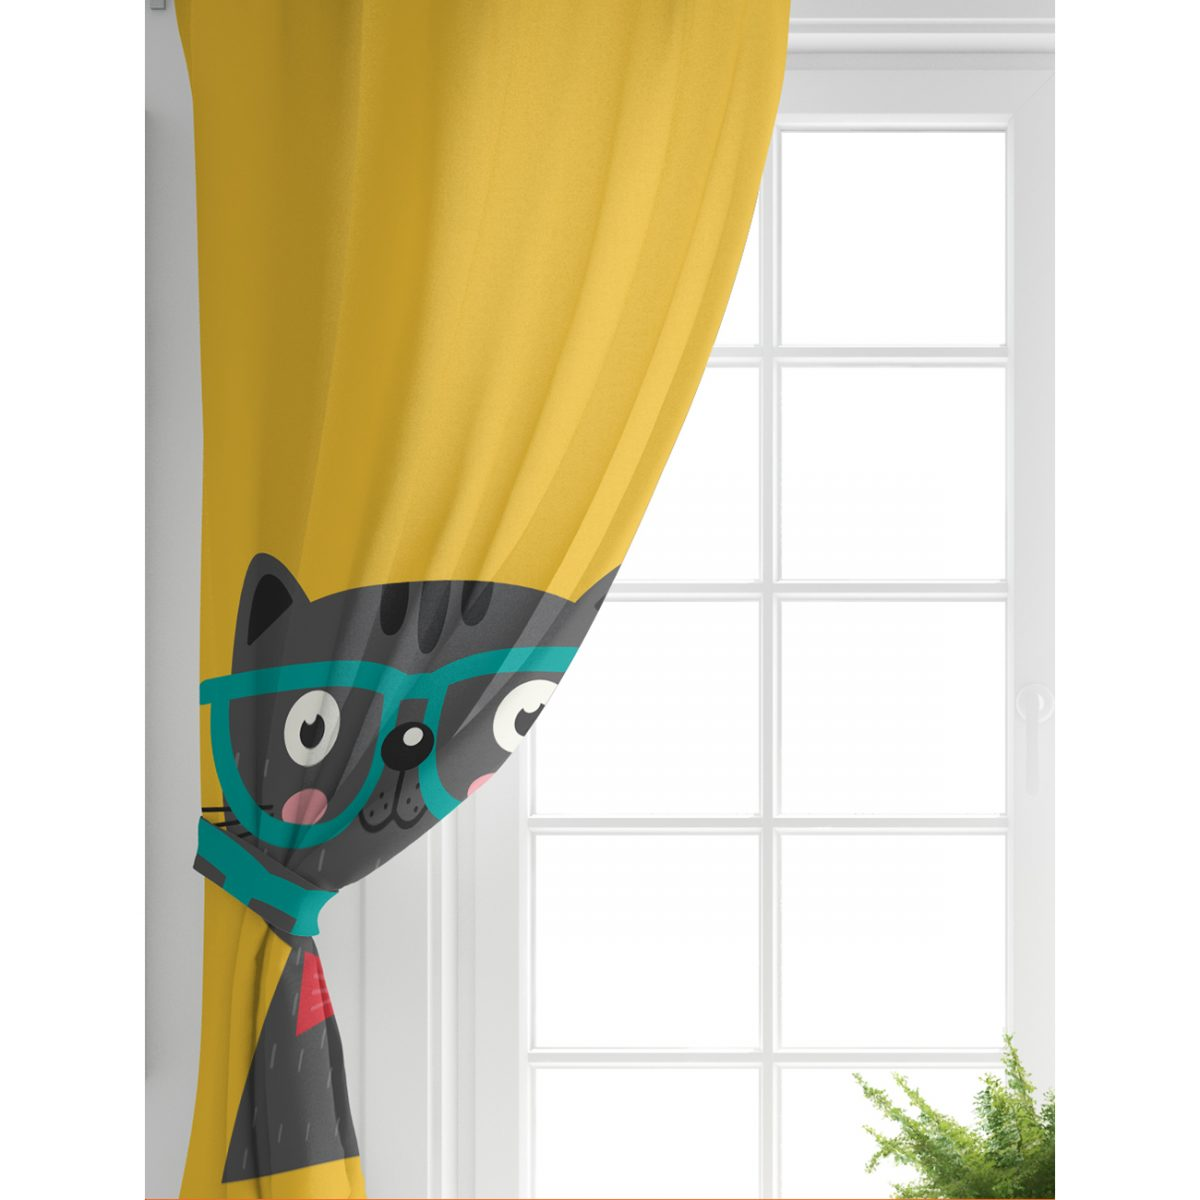 Realhomes Renkli Kedi Dijital Baskılı Modern Çocuk Odası Fon Perde Realhomes